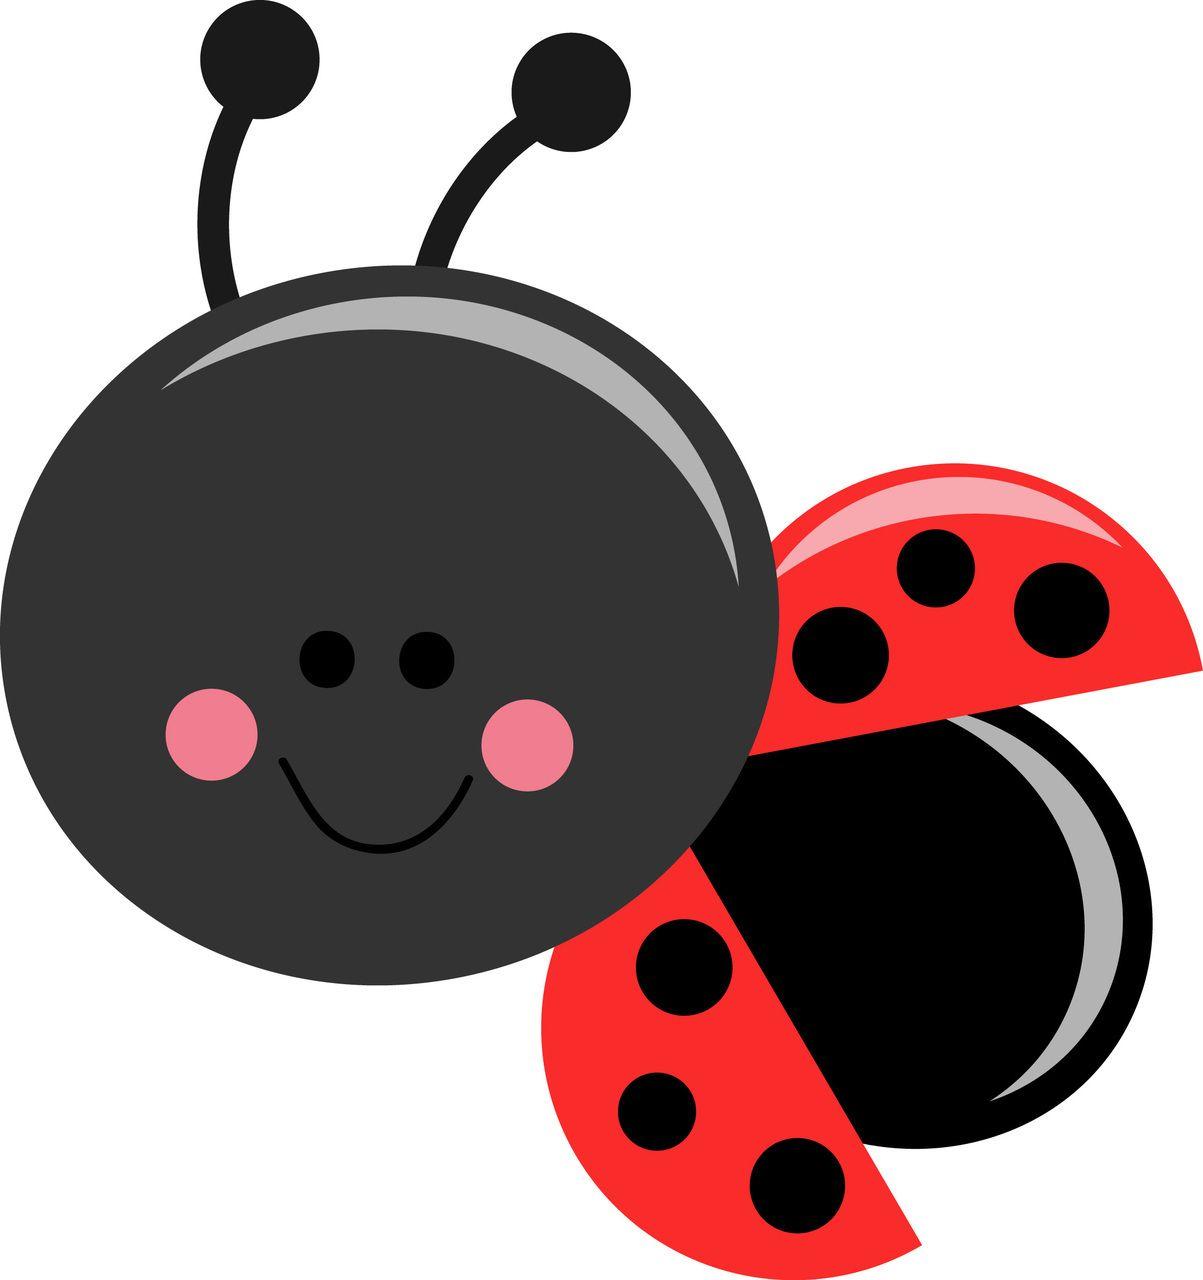 1203x1280 Ladybug Graphics Cute Ladybug Images Free Cliparts That You